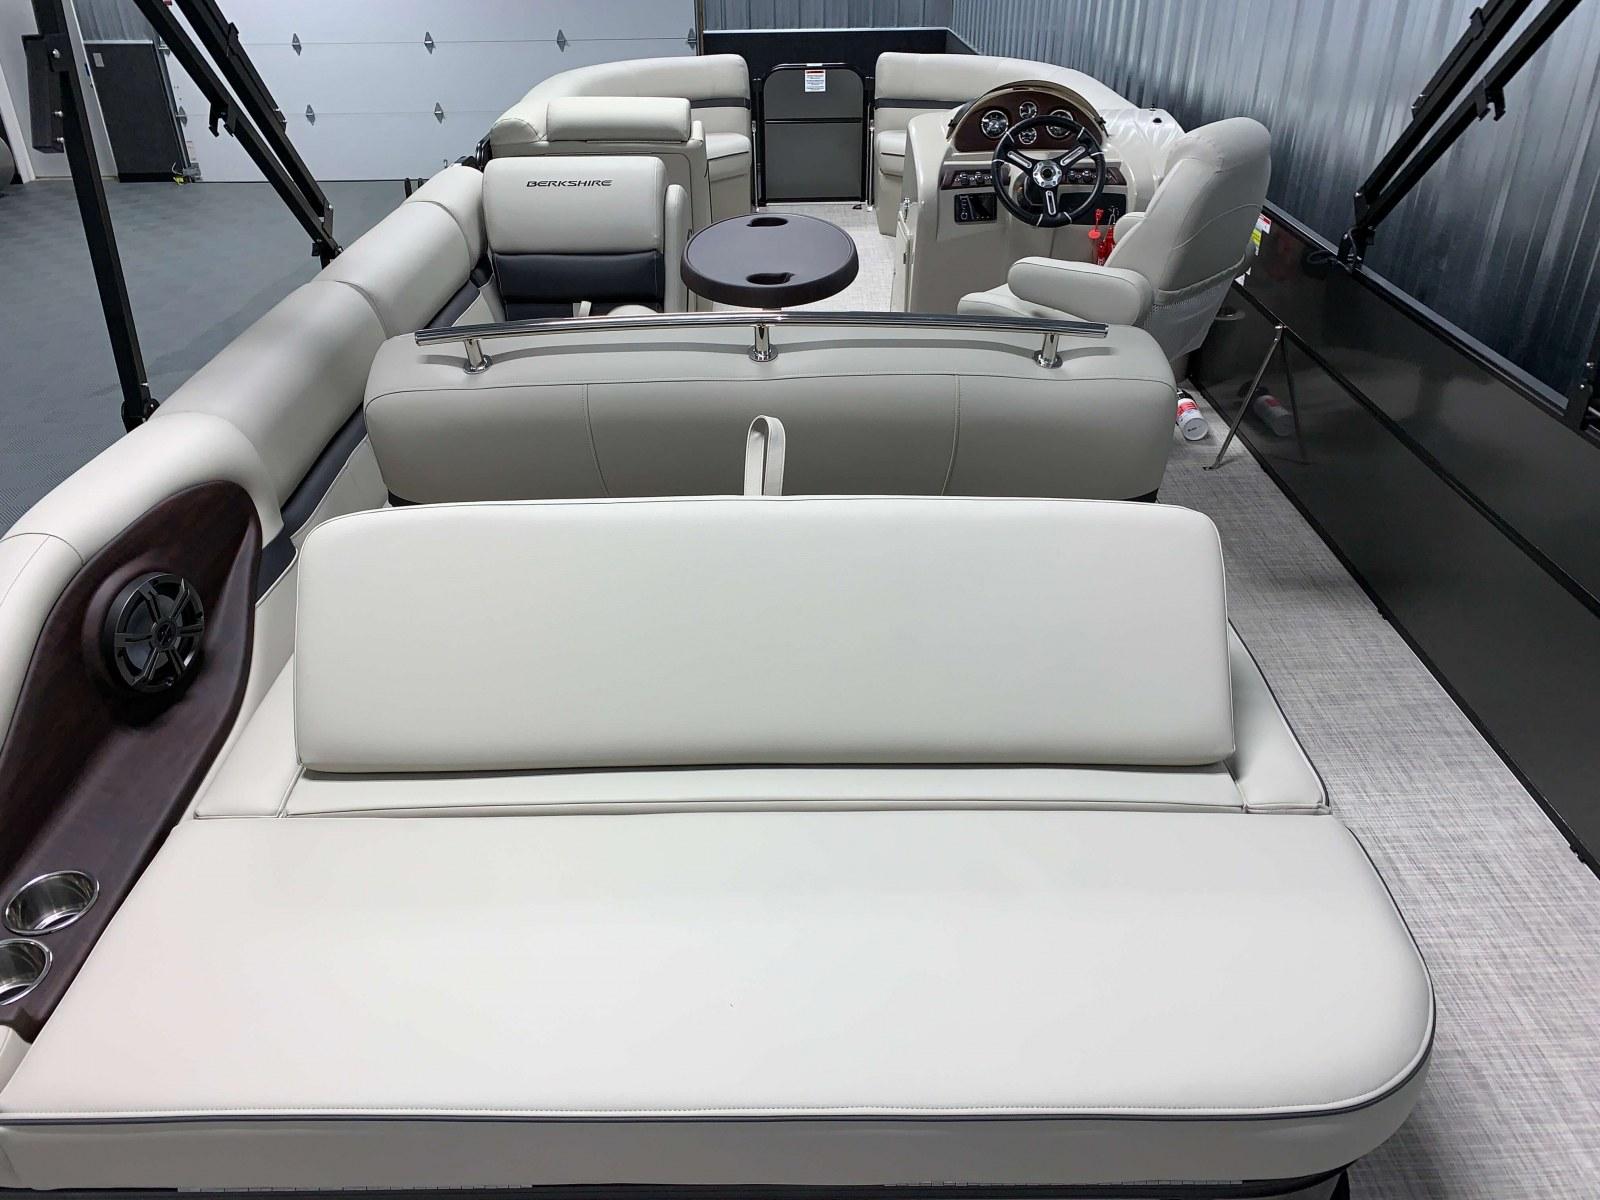 2020-Berkshire-24SB2-CTS-Interior-Seating-Layout-3